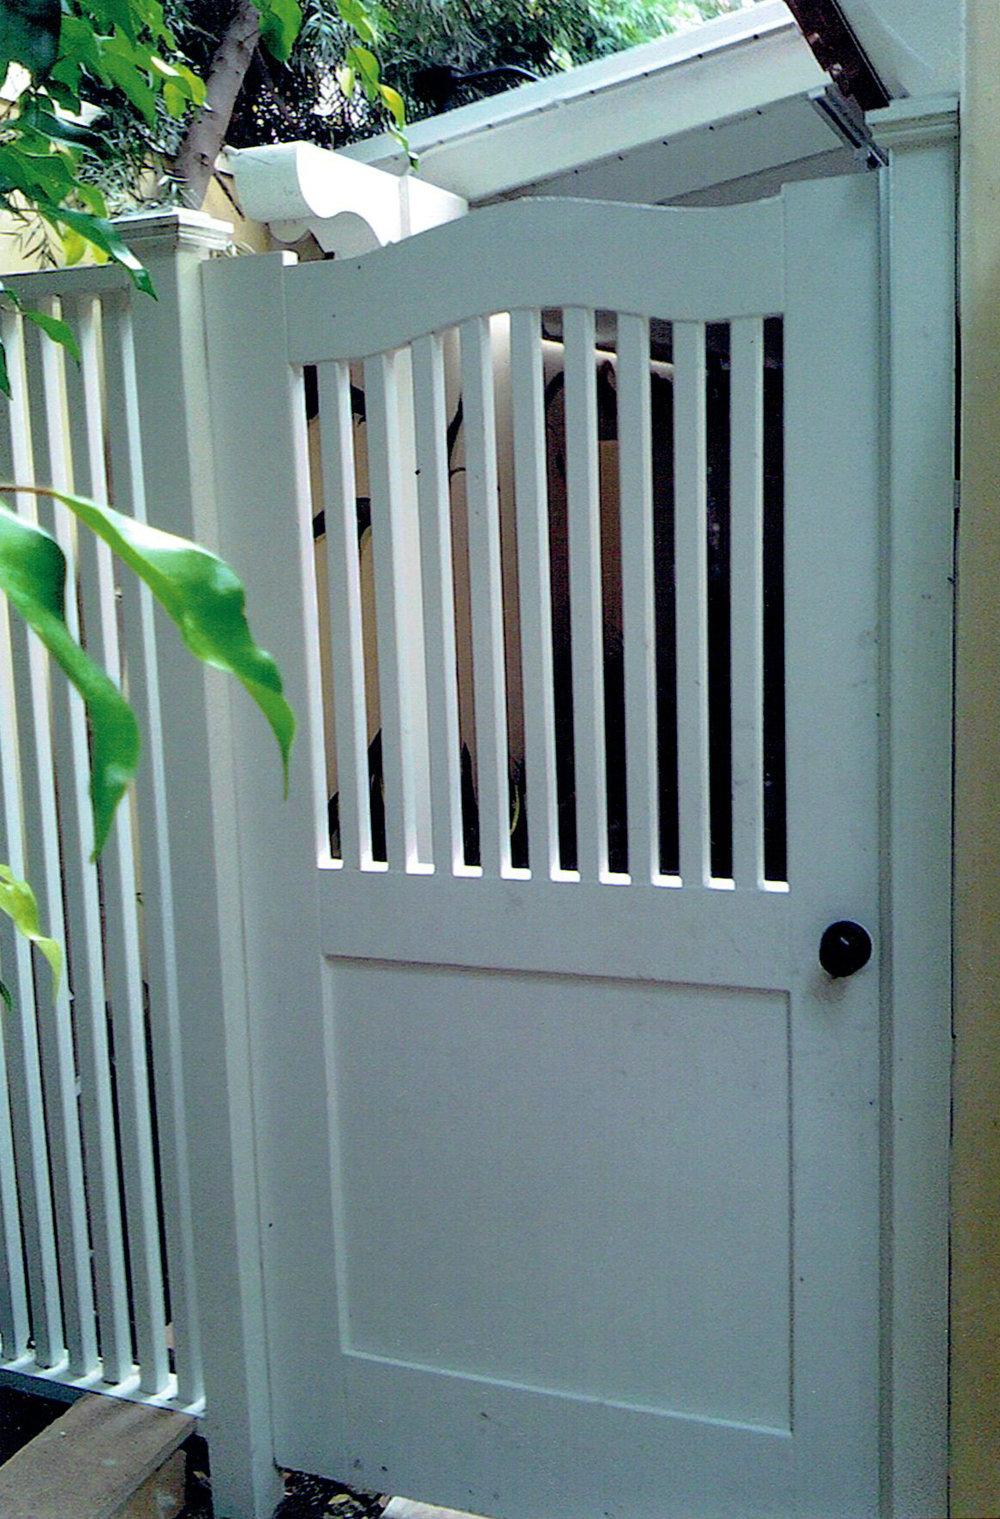 Exterior Fence & Gate.jpg